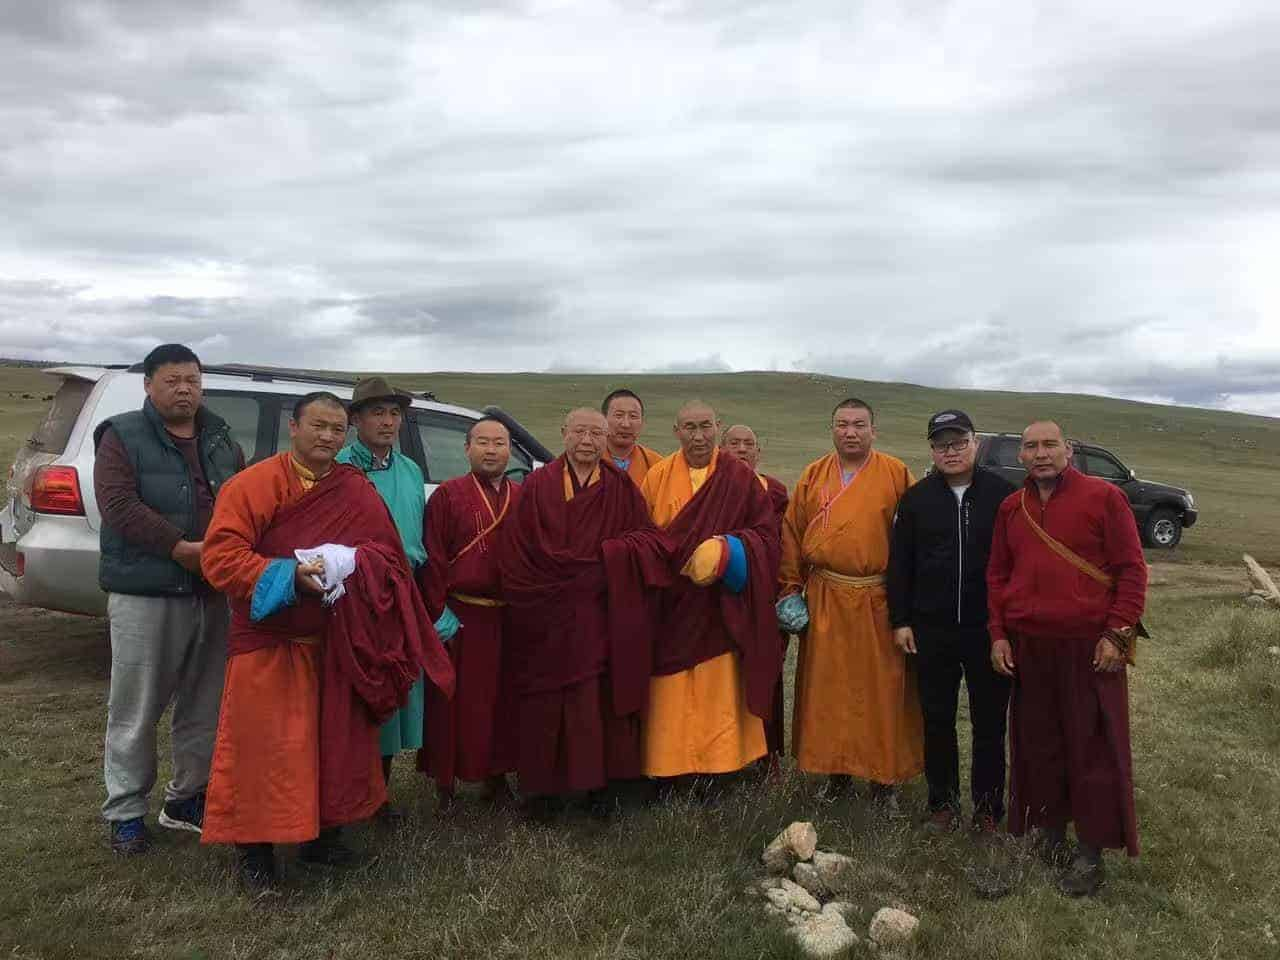 gosok-rinpoche-mongolia-2016-bacb8c3cdc169390904e8fa6945ddc4